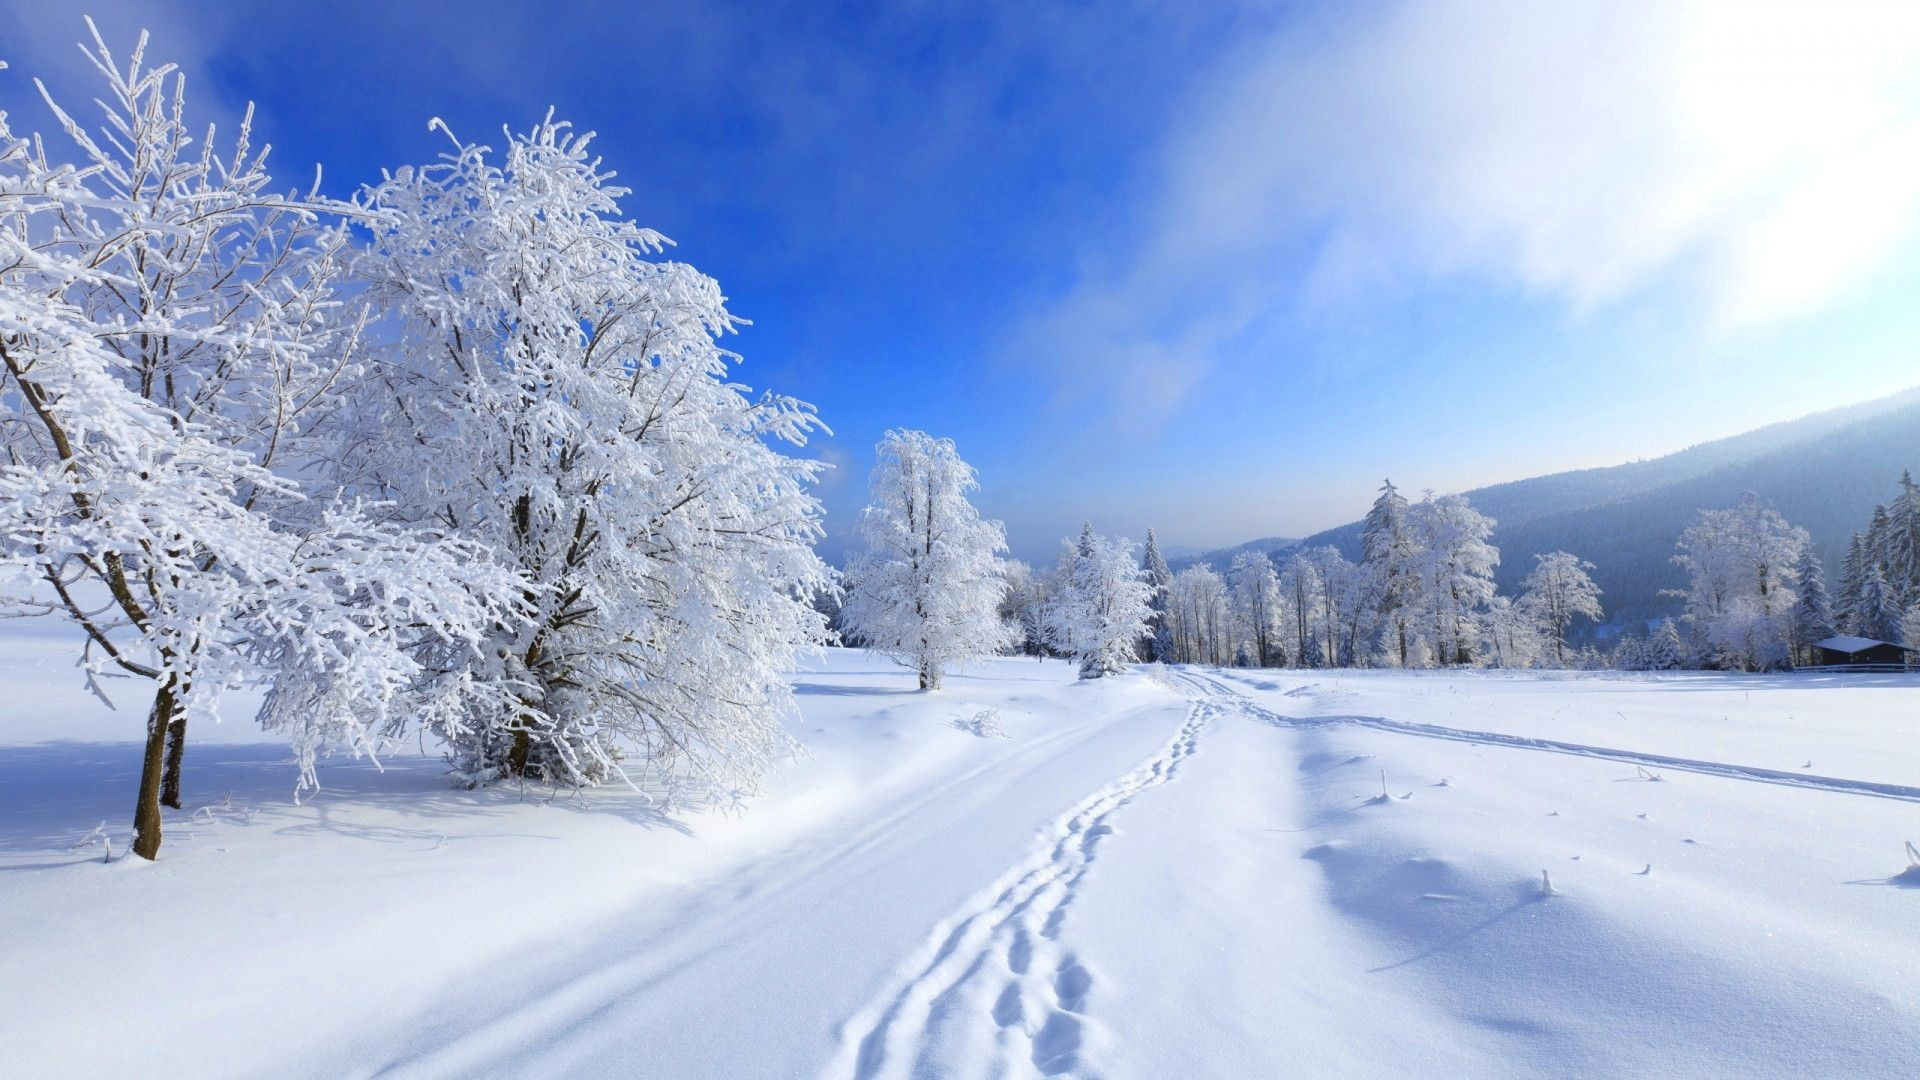 Wallpaper · Winter background HD